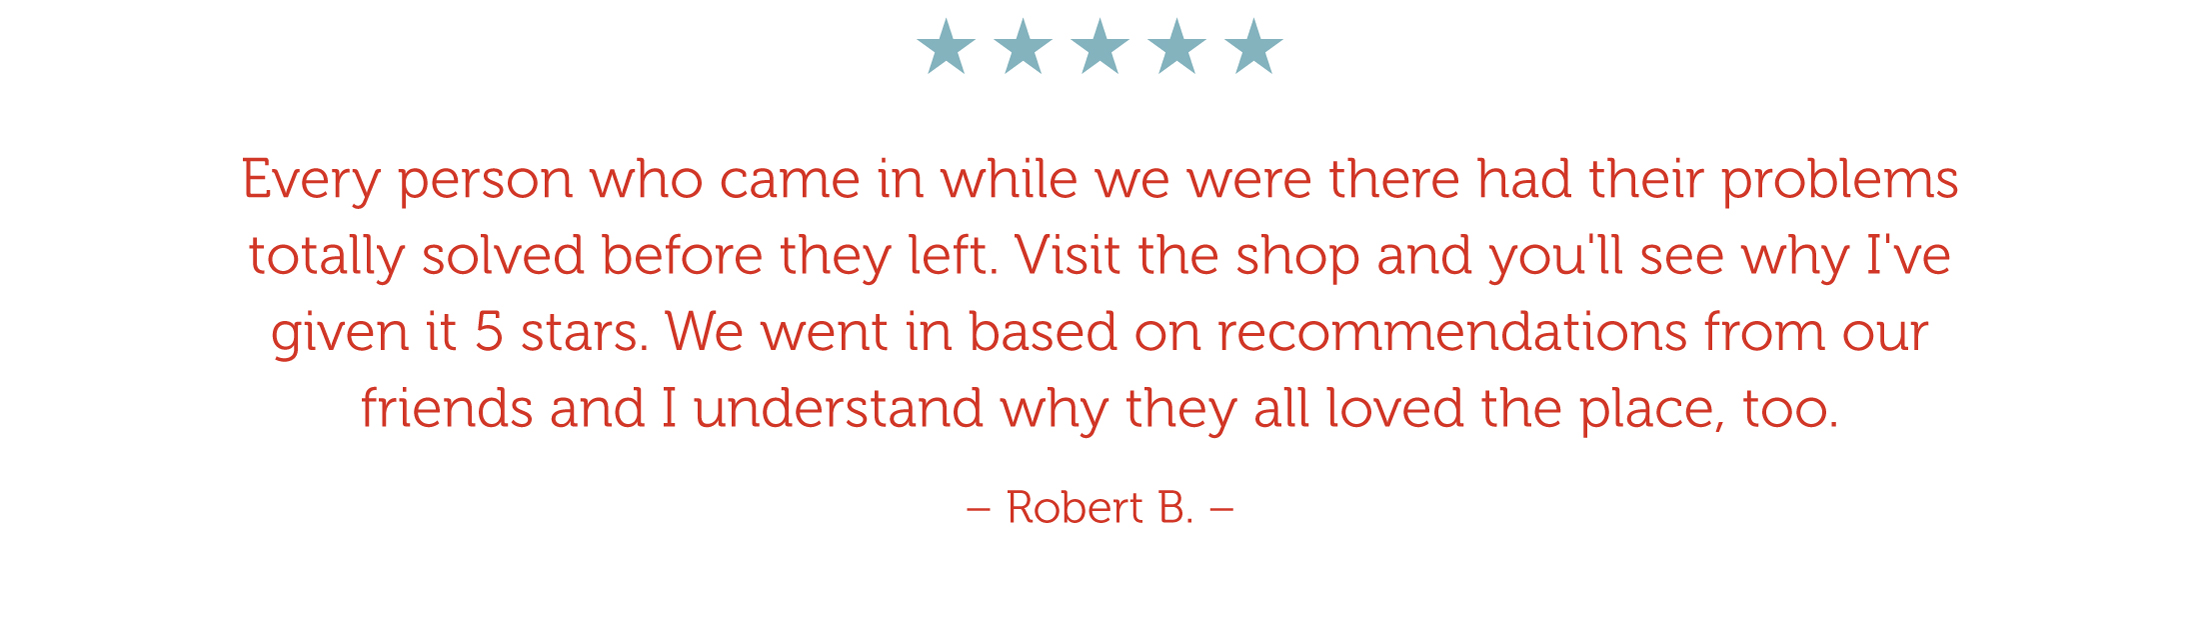 pc-review-robert-b-1x3.jpg